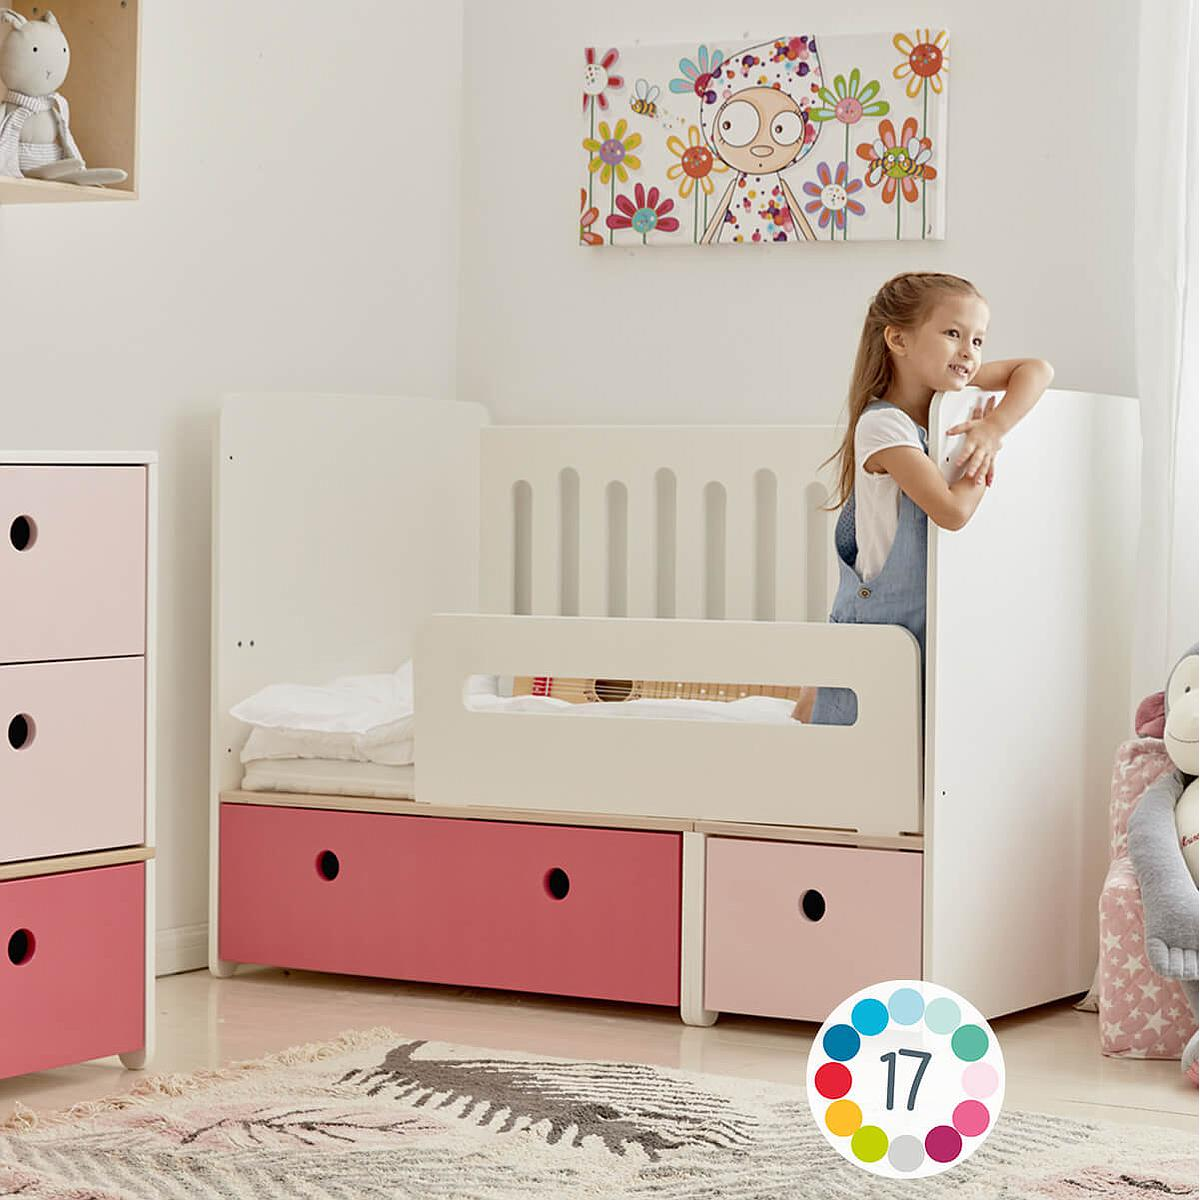 Cuna cama 70x140cm COLORFLEX Abitare Kids sweet pink-pearl grey